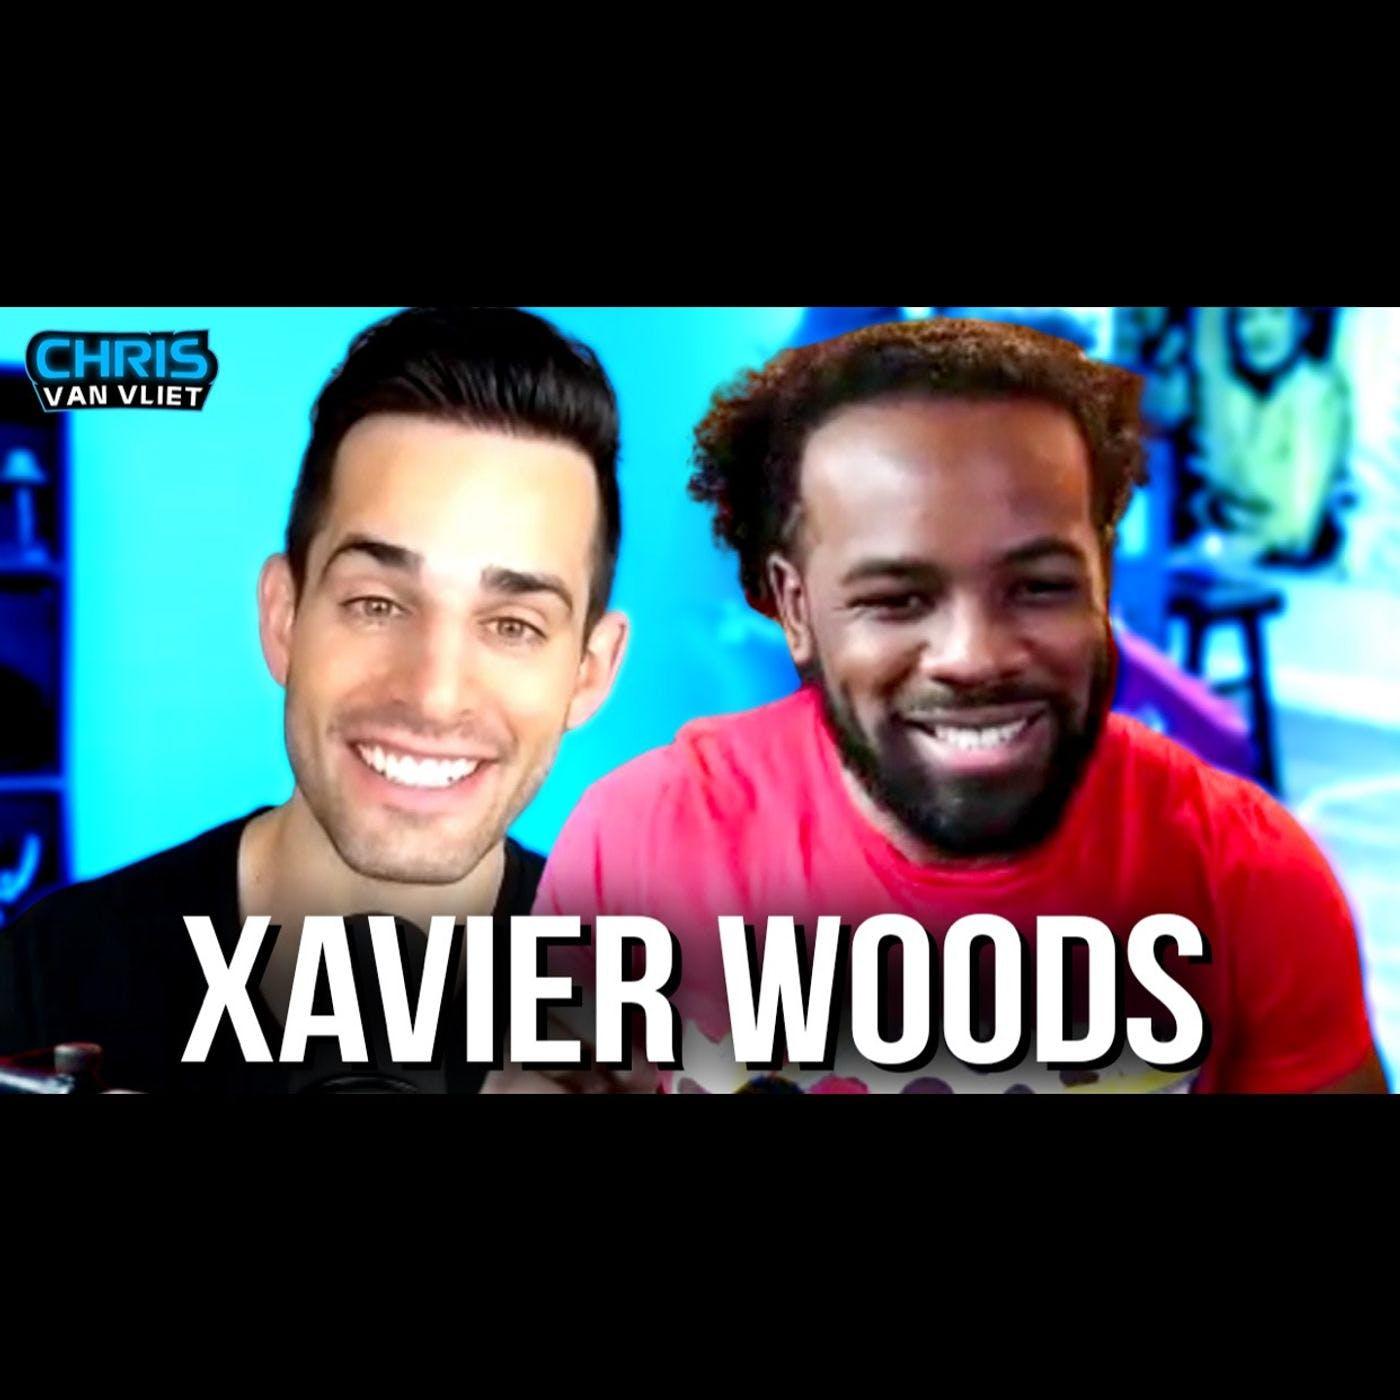 Xavier Woods on The New Day, UpUpDownDown, G4TV, Kofi's title win